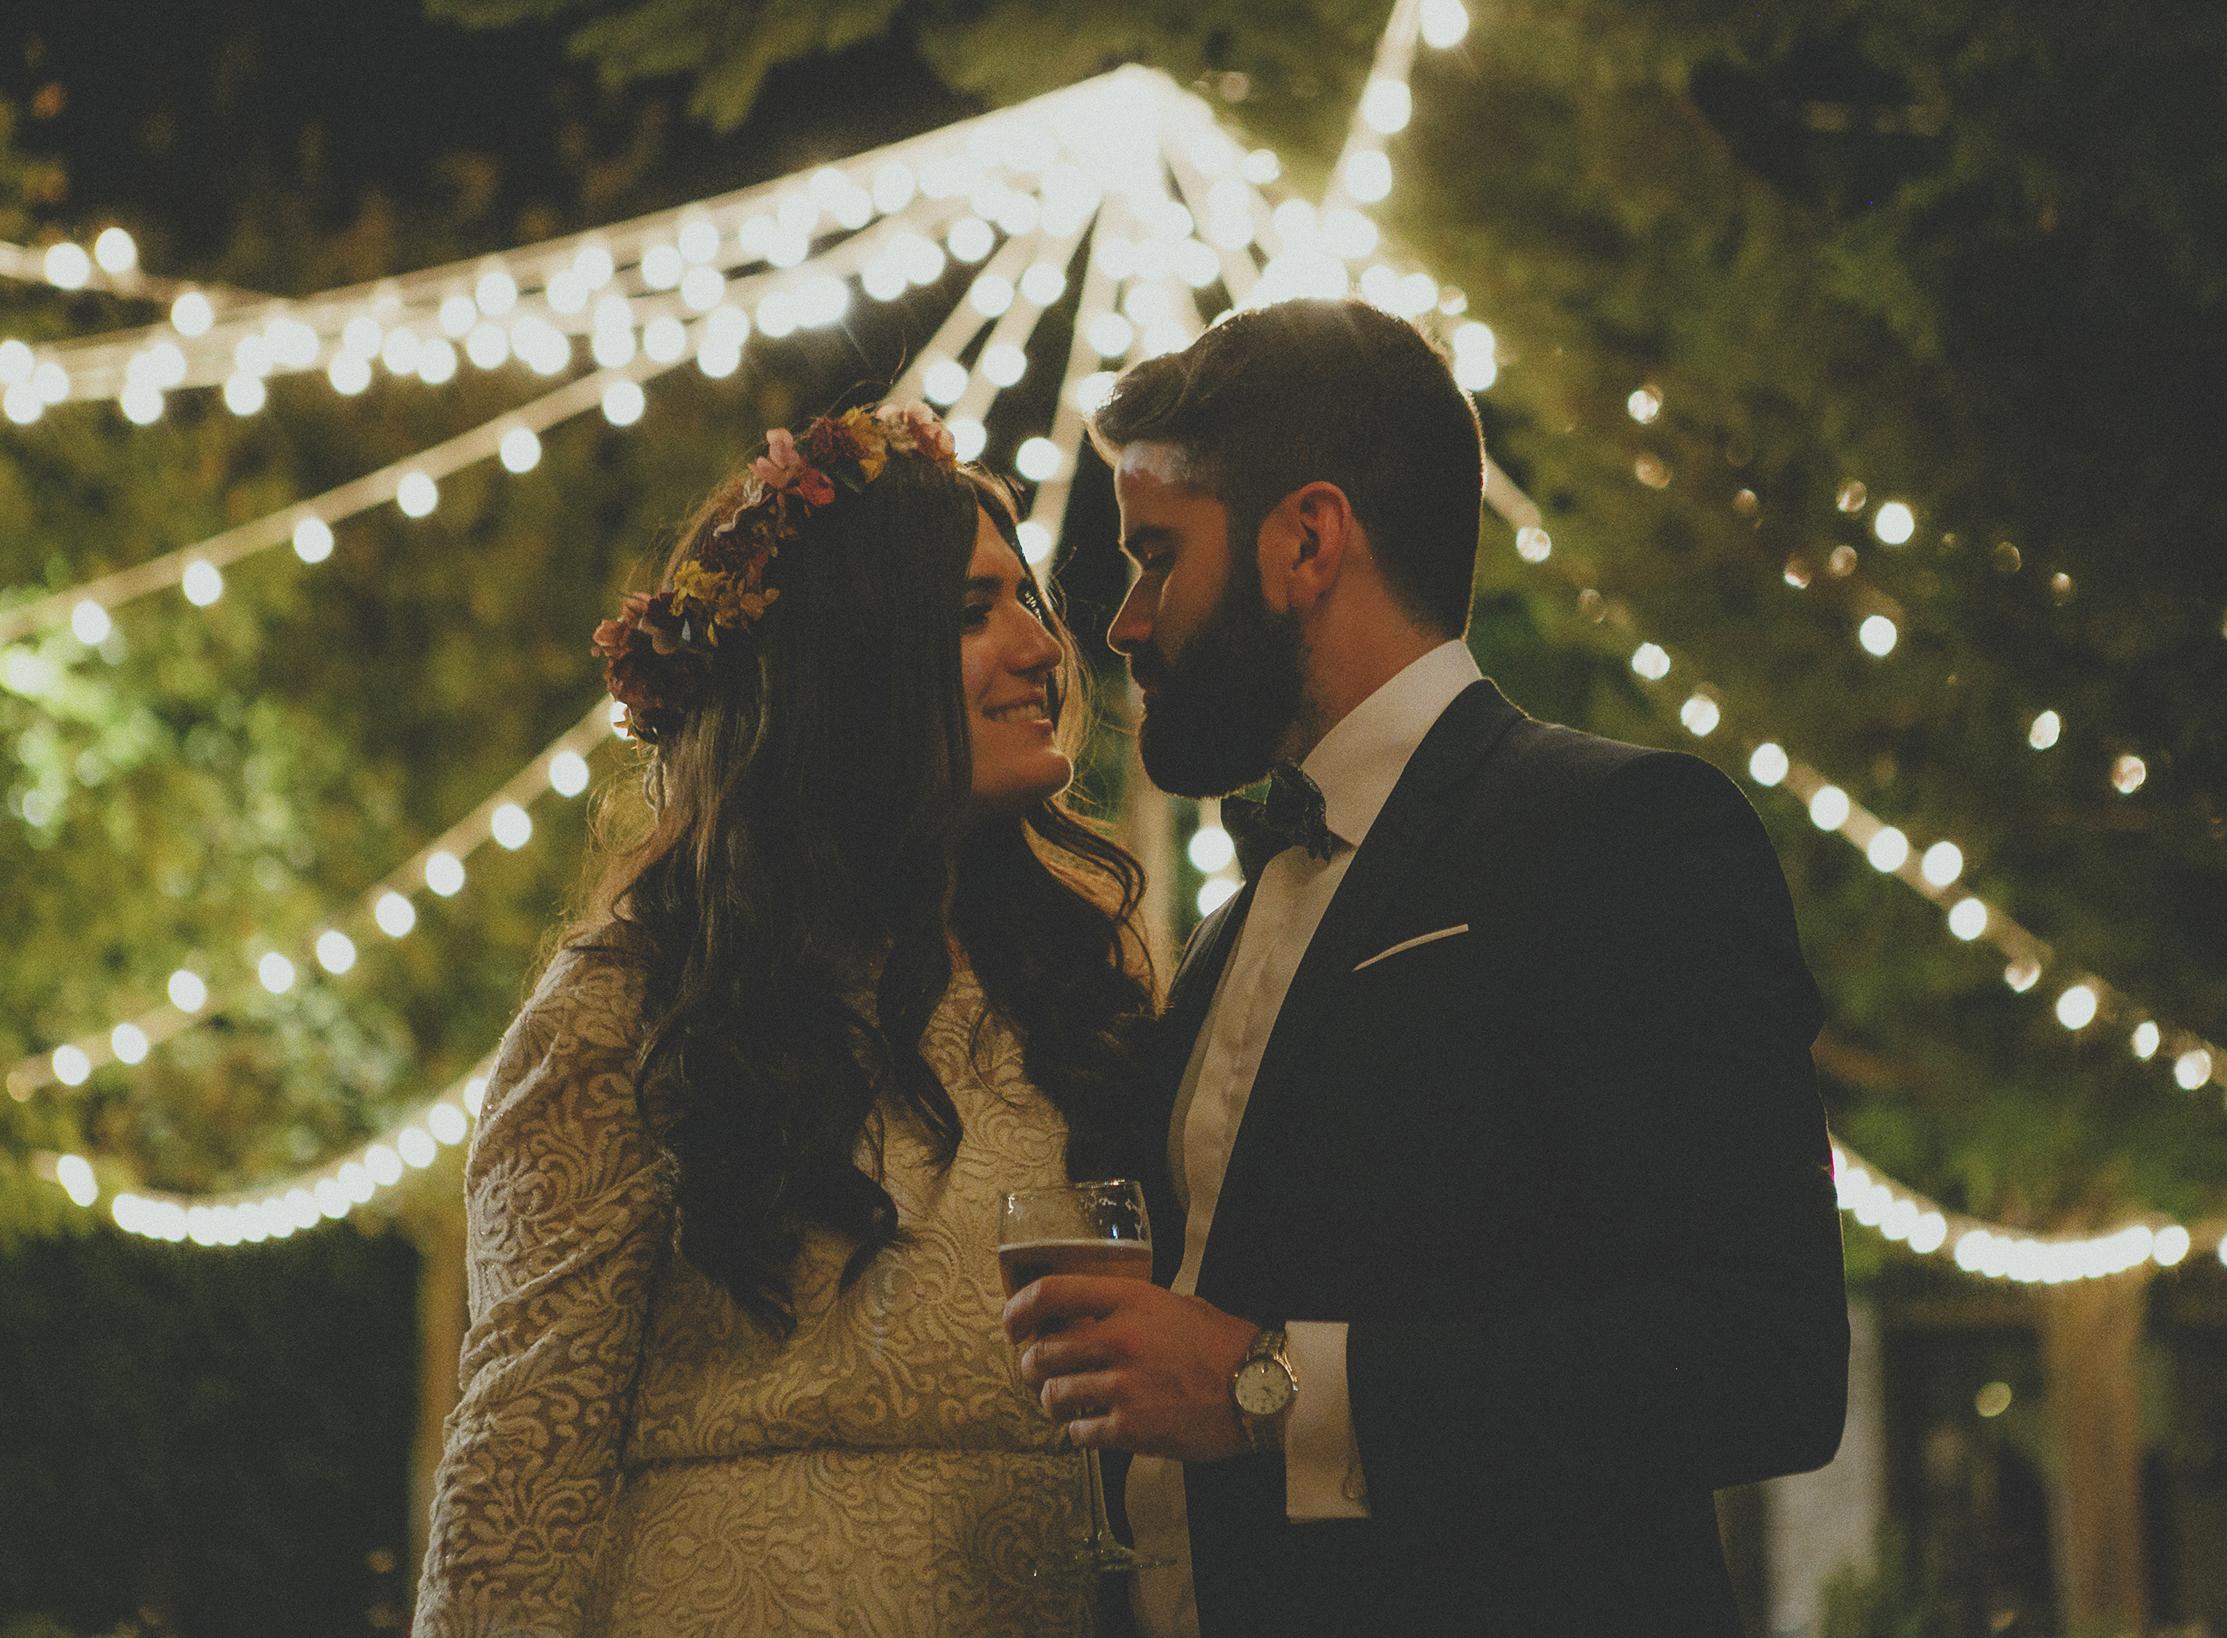 Una boda divertida en la Mancha